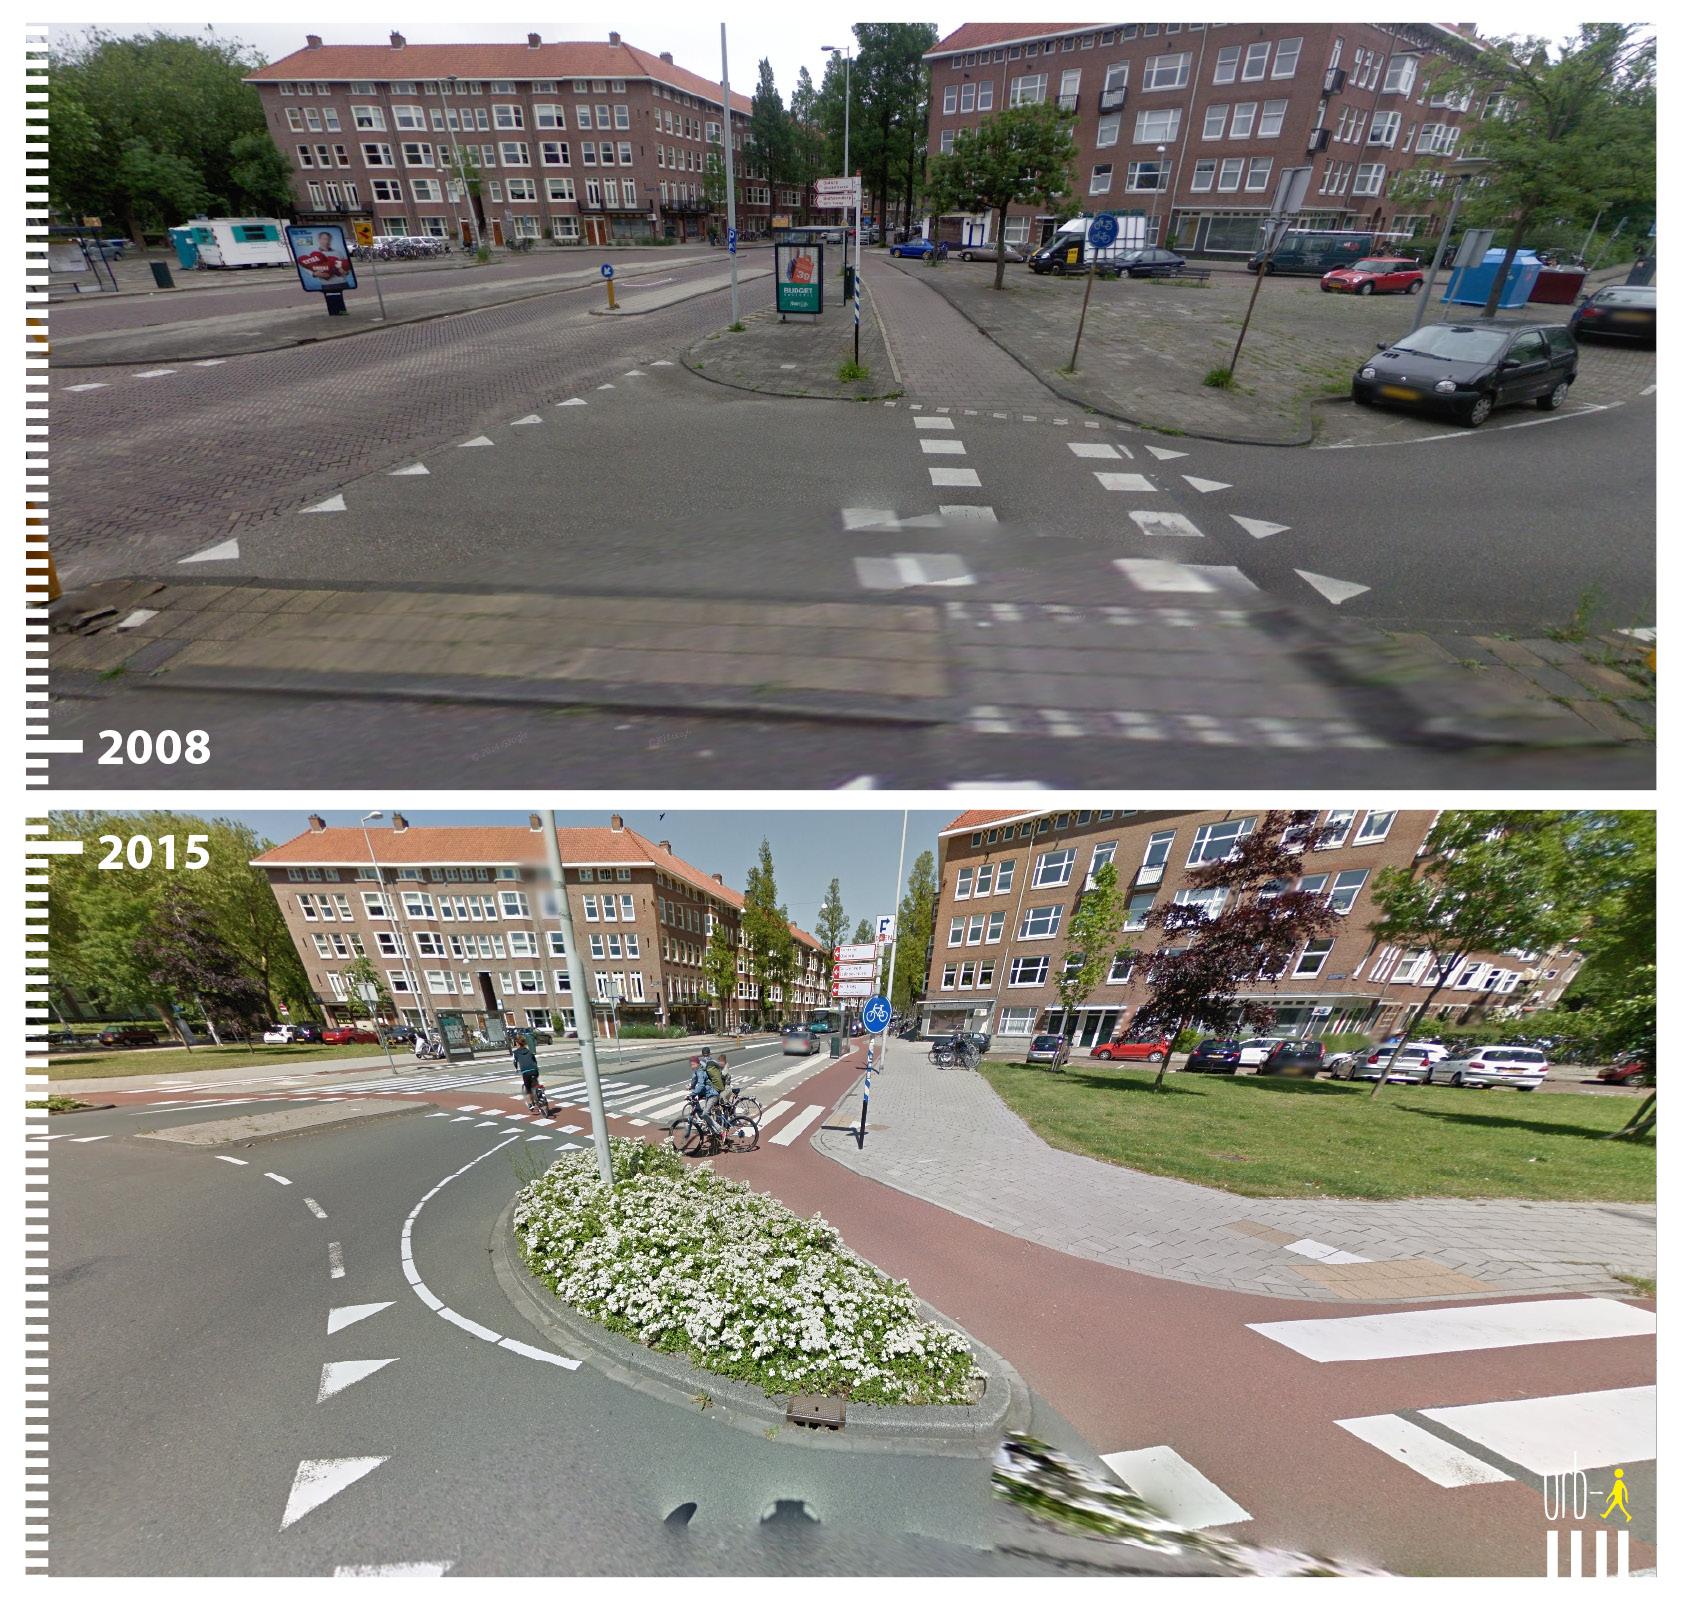 0842 NL Amsterdam, Aalsmeerplein